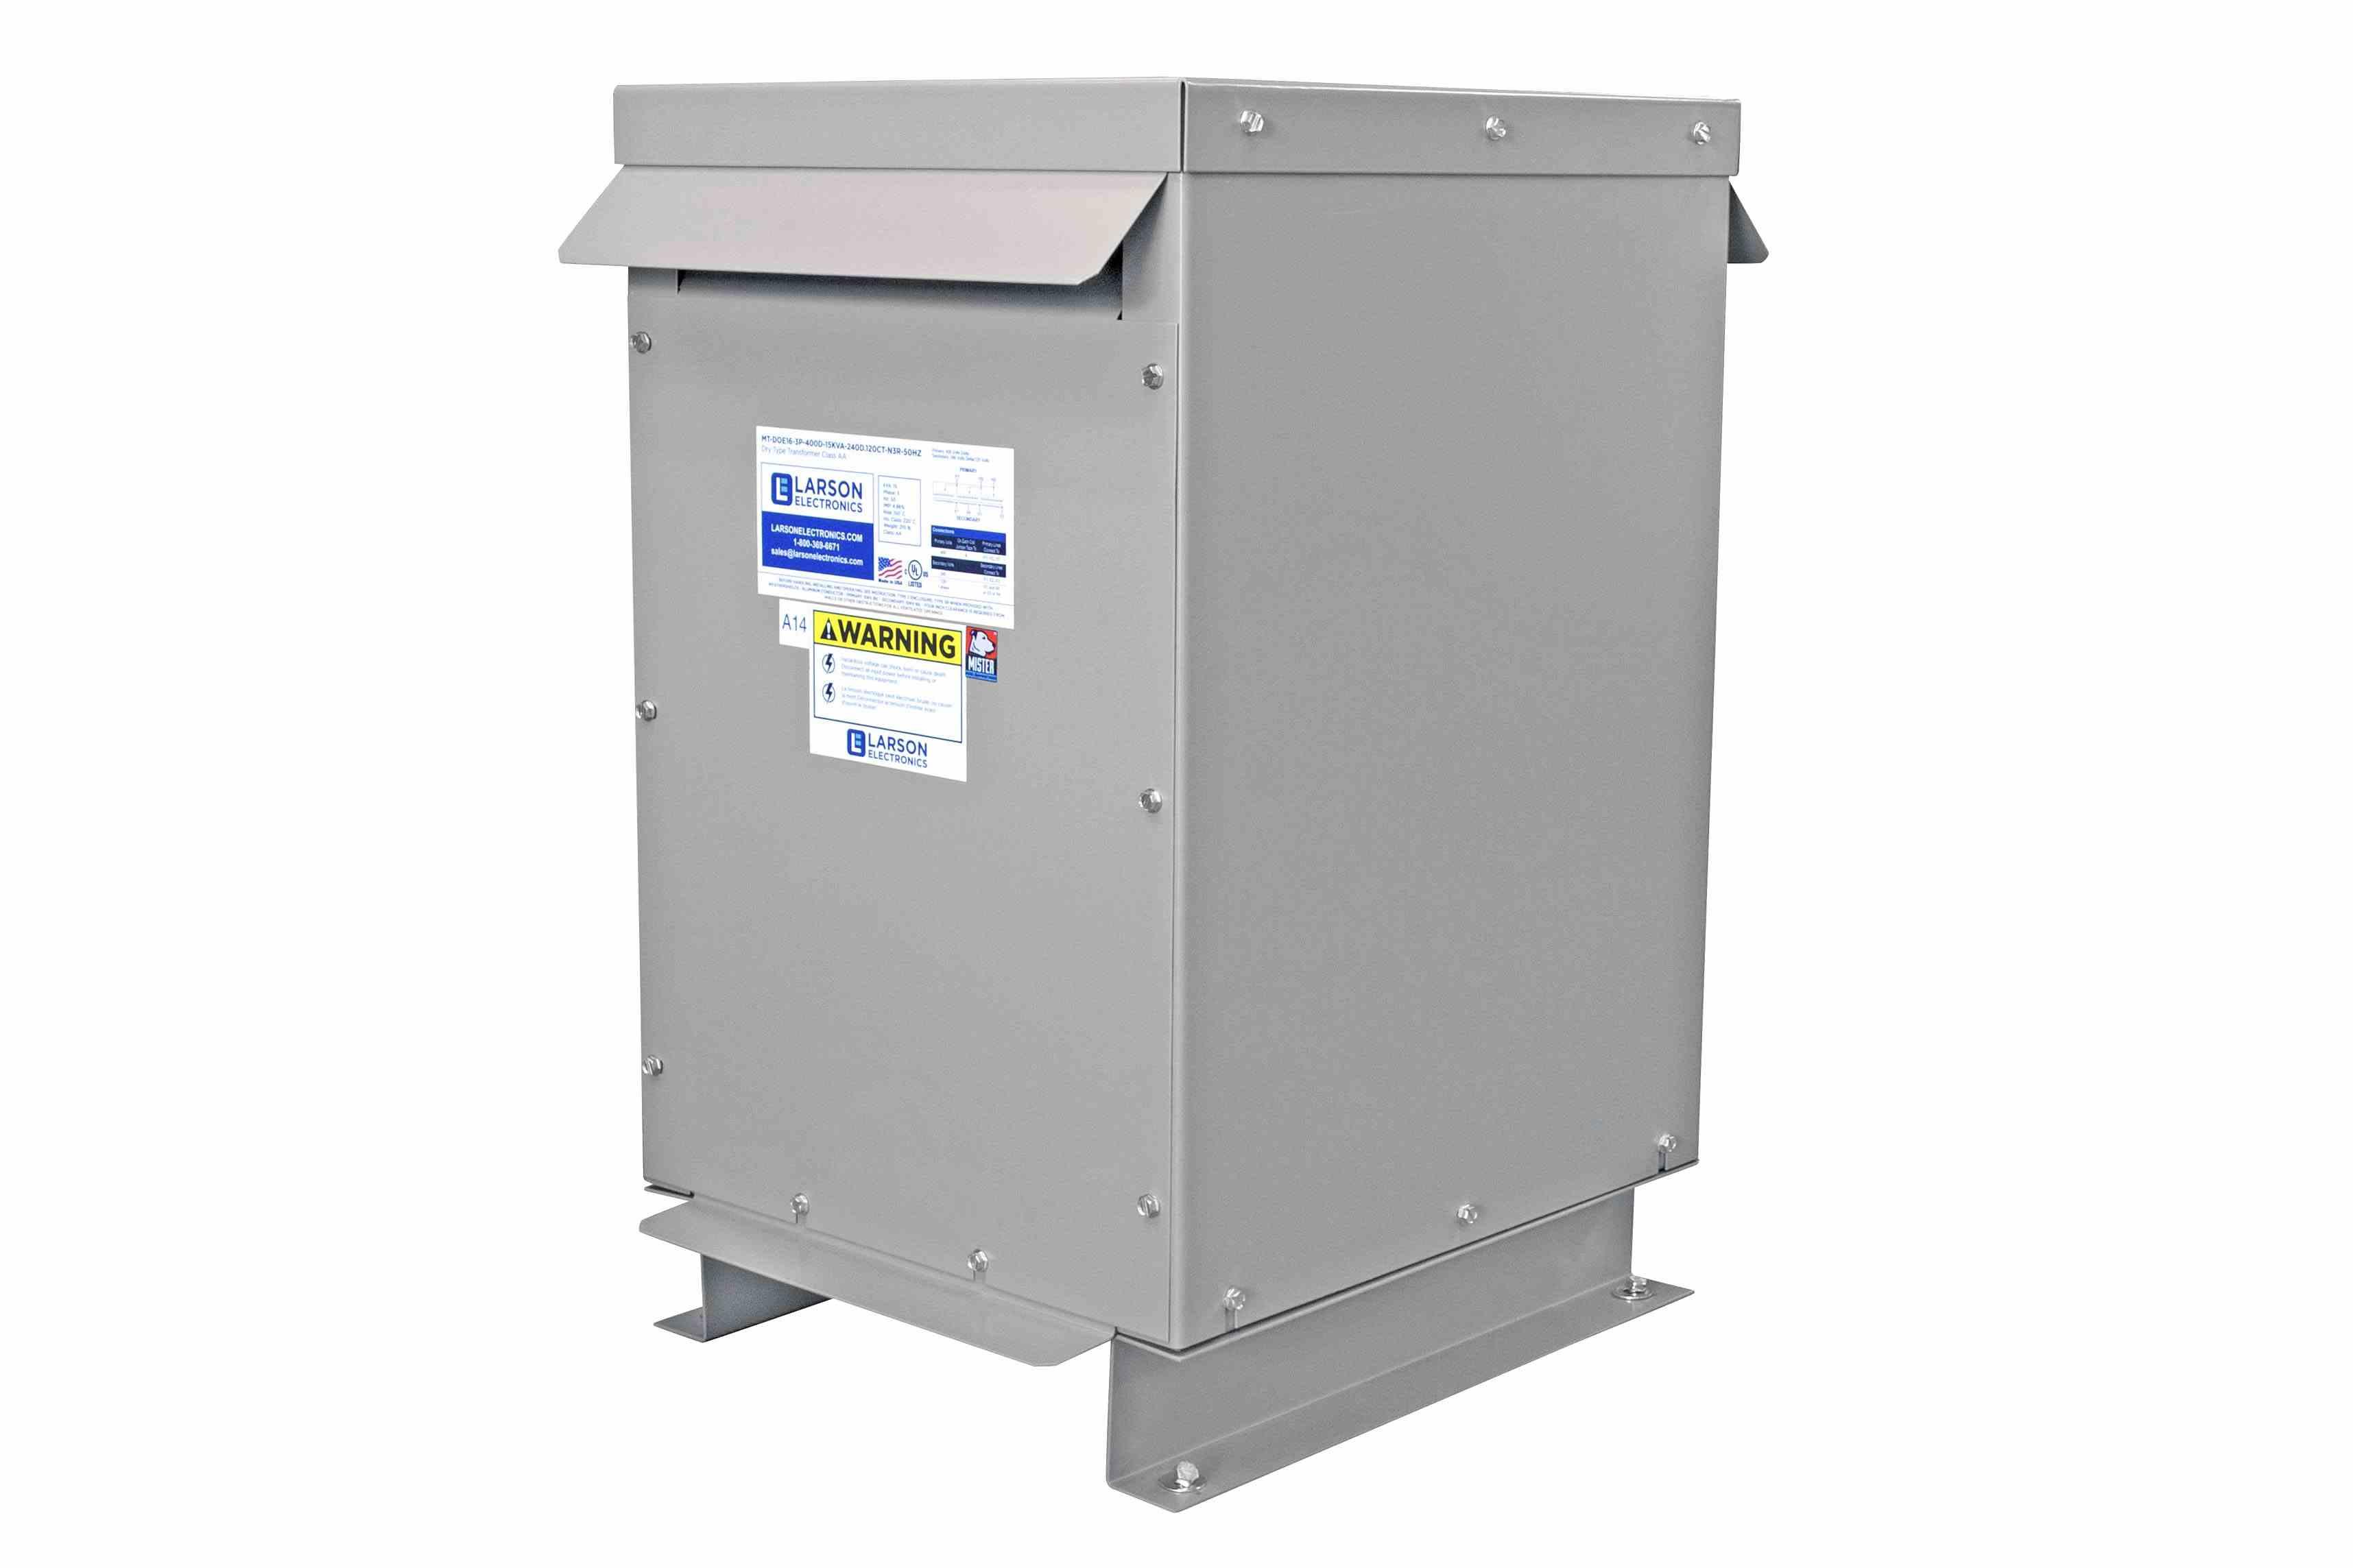 15 kVA 3PH Isolation Transformer, 208V Wye Primary, 380Y/220 Wye-N Secondary, N3R, Ventilated, 60 Hz